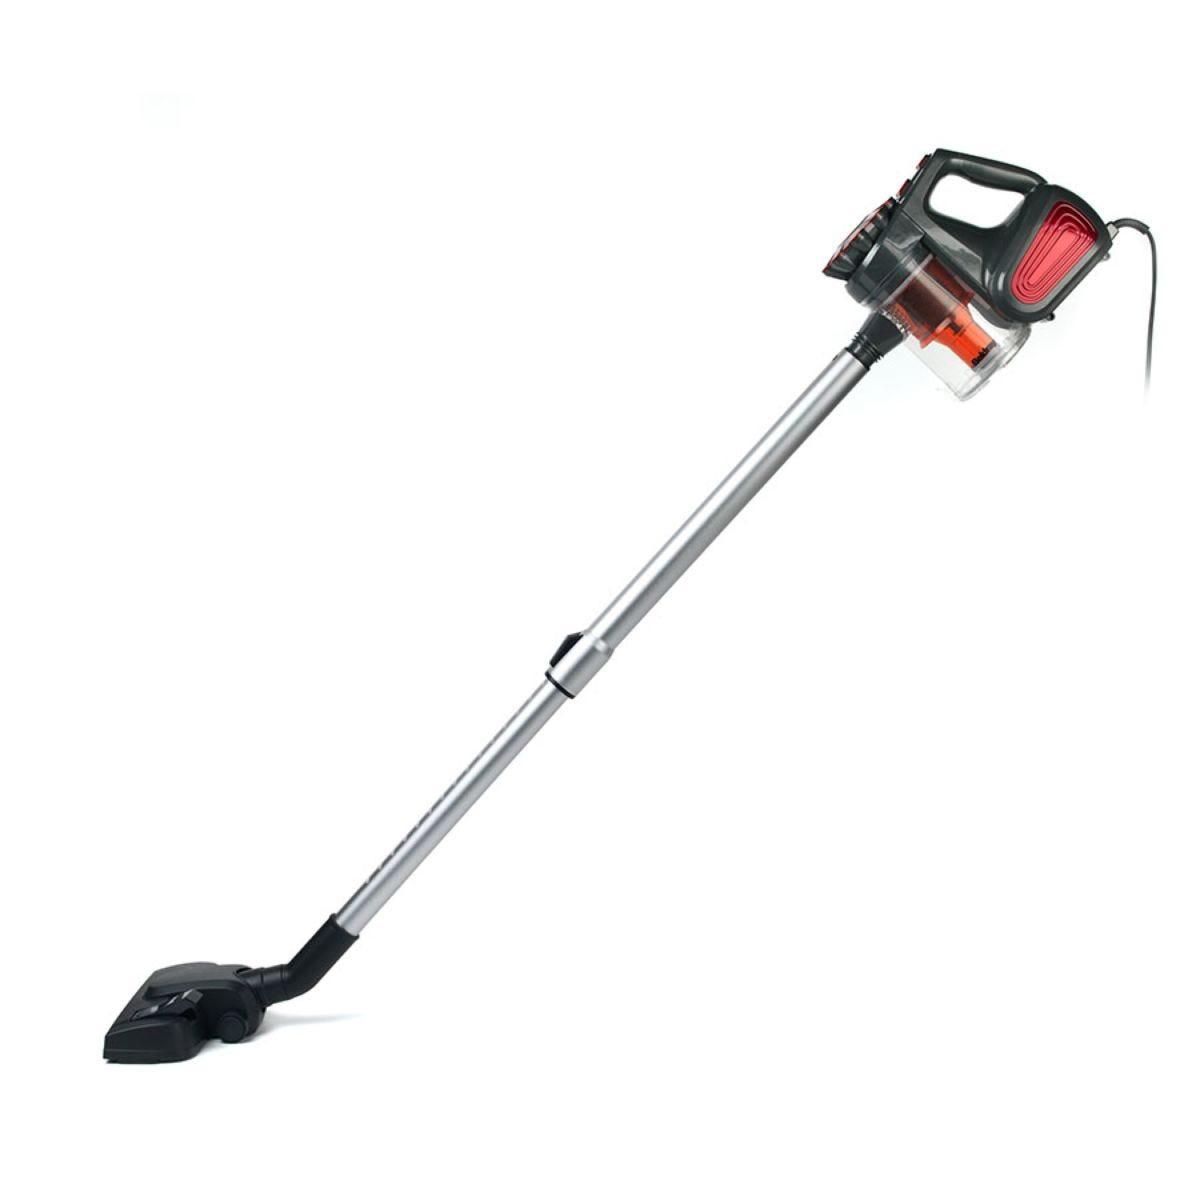 Beldray BEL0690 Quick Vac Lite 2-in-1 Vacuum Cleaner